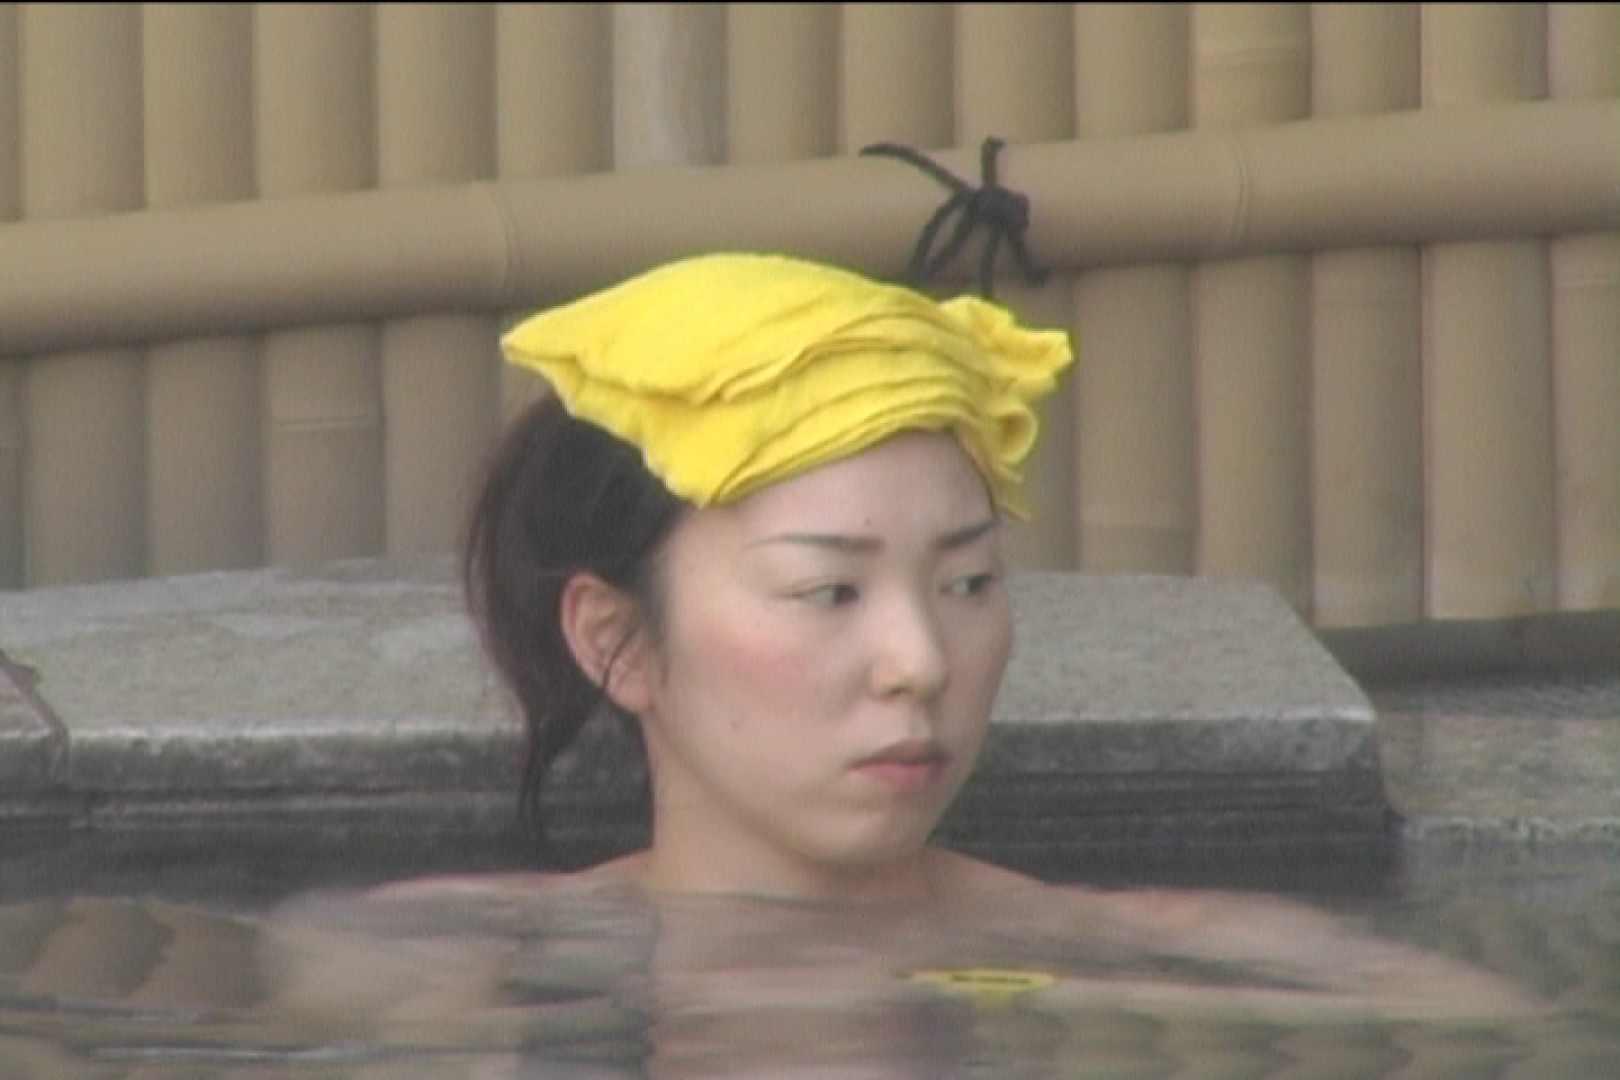 Aquaな露天風呂Vol.529 盗撮映像  51Pix 40